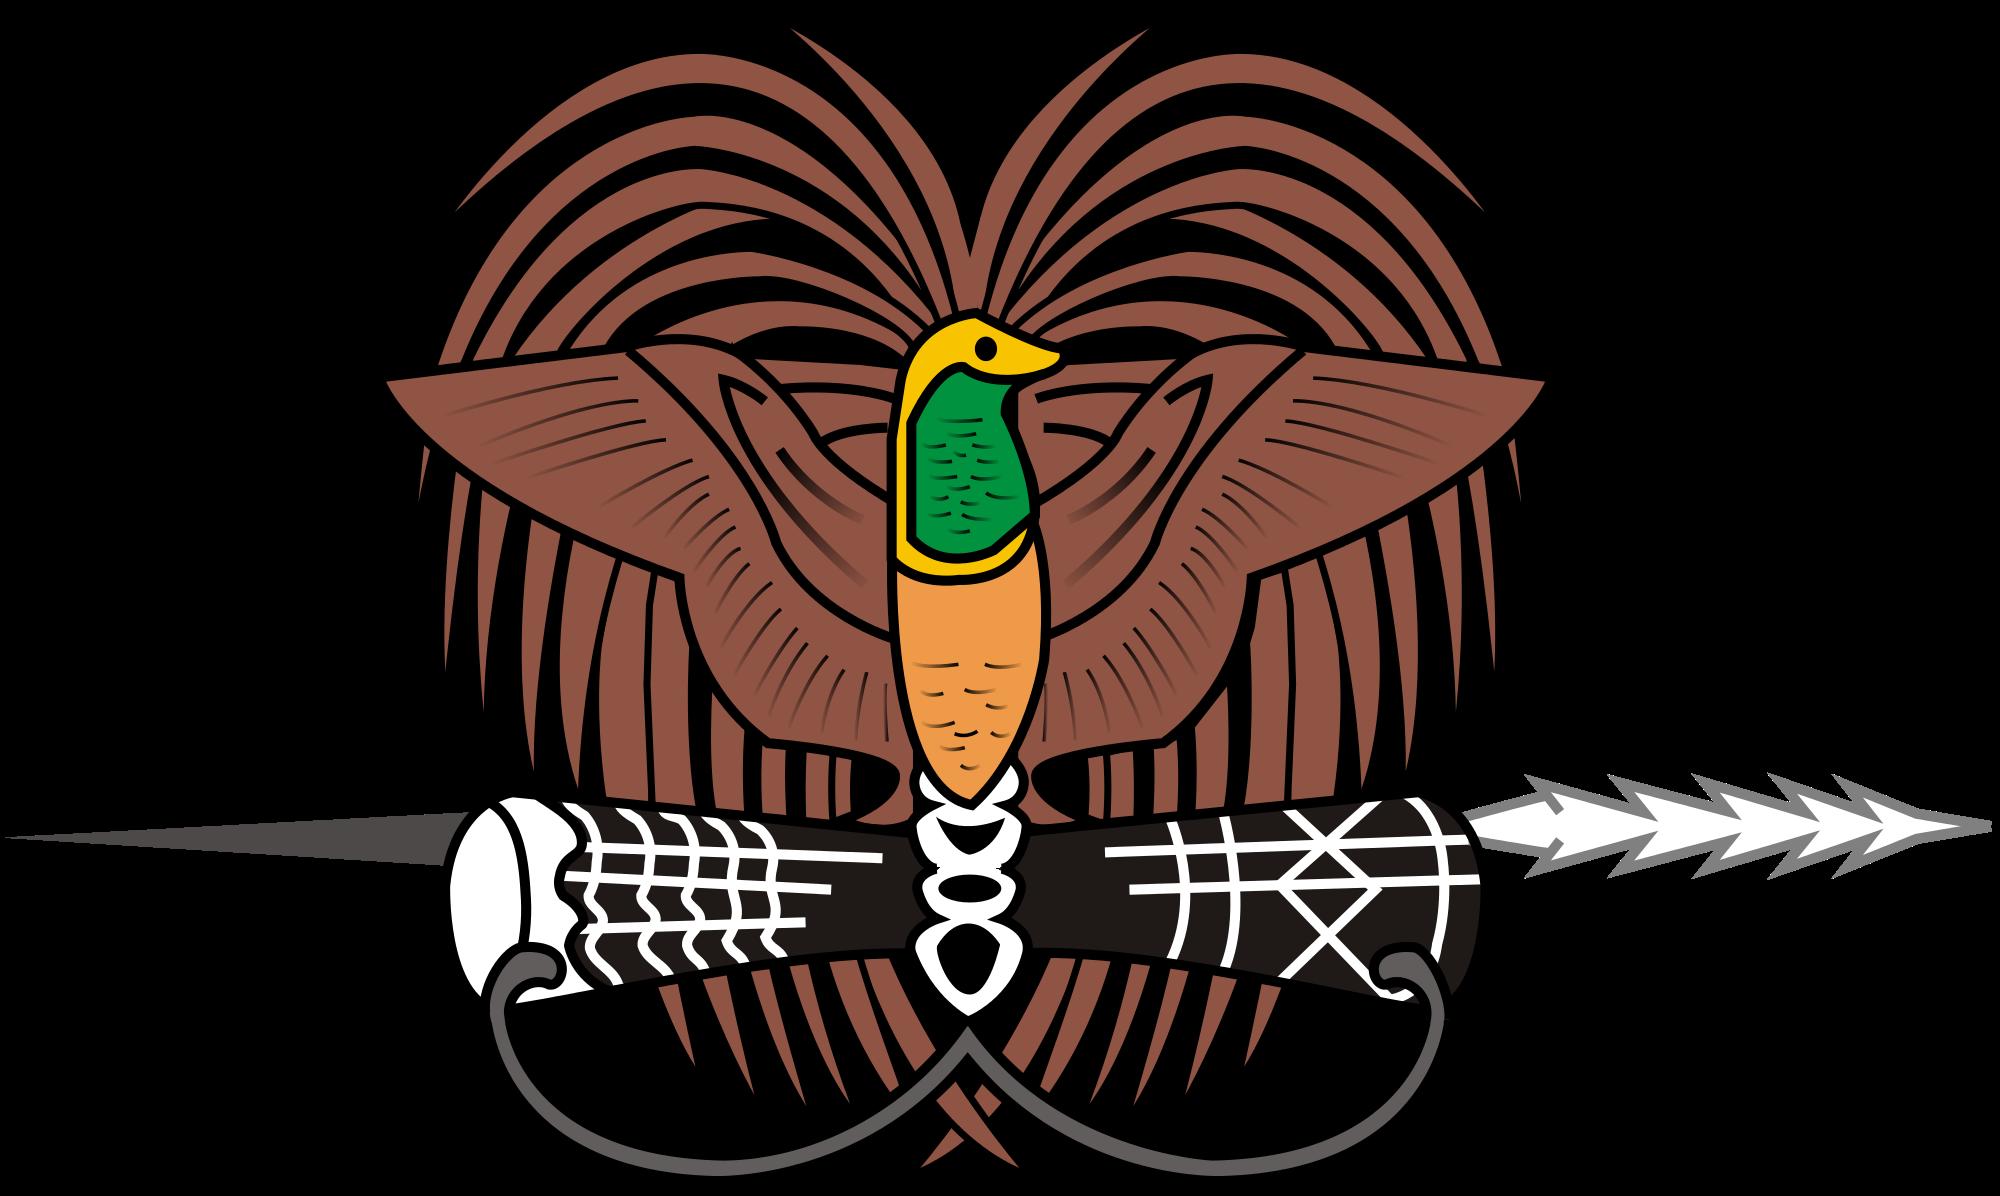 File:Emblem of Papua New Guinea.svg.